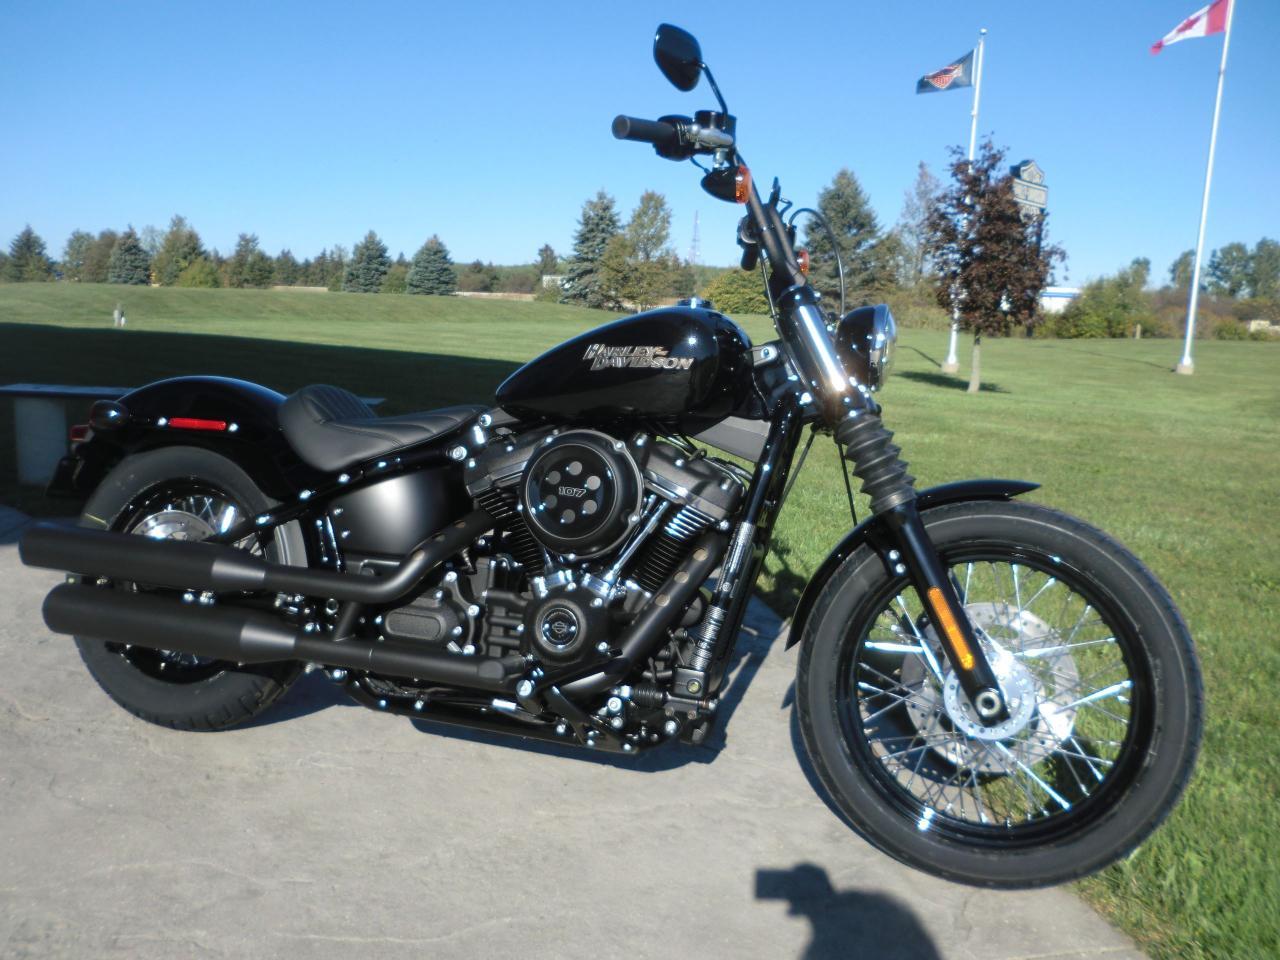 New 2018 Harley Davidson Softail Fxbb Street Bob For Sale